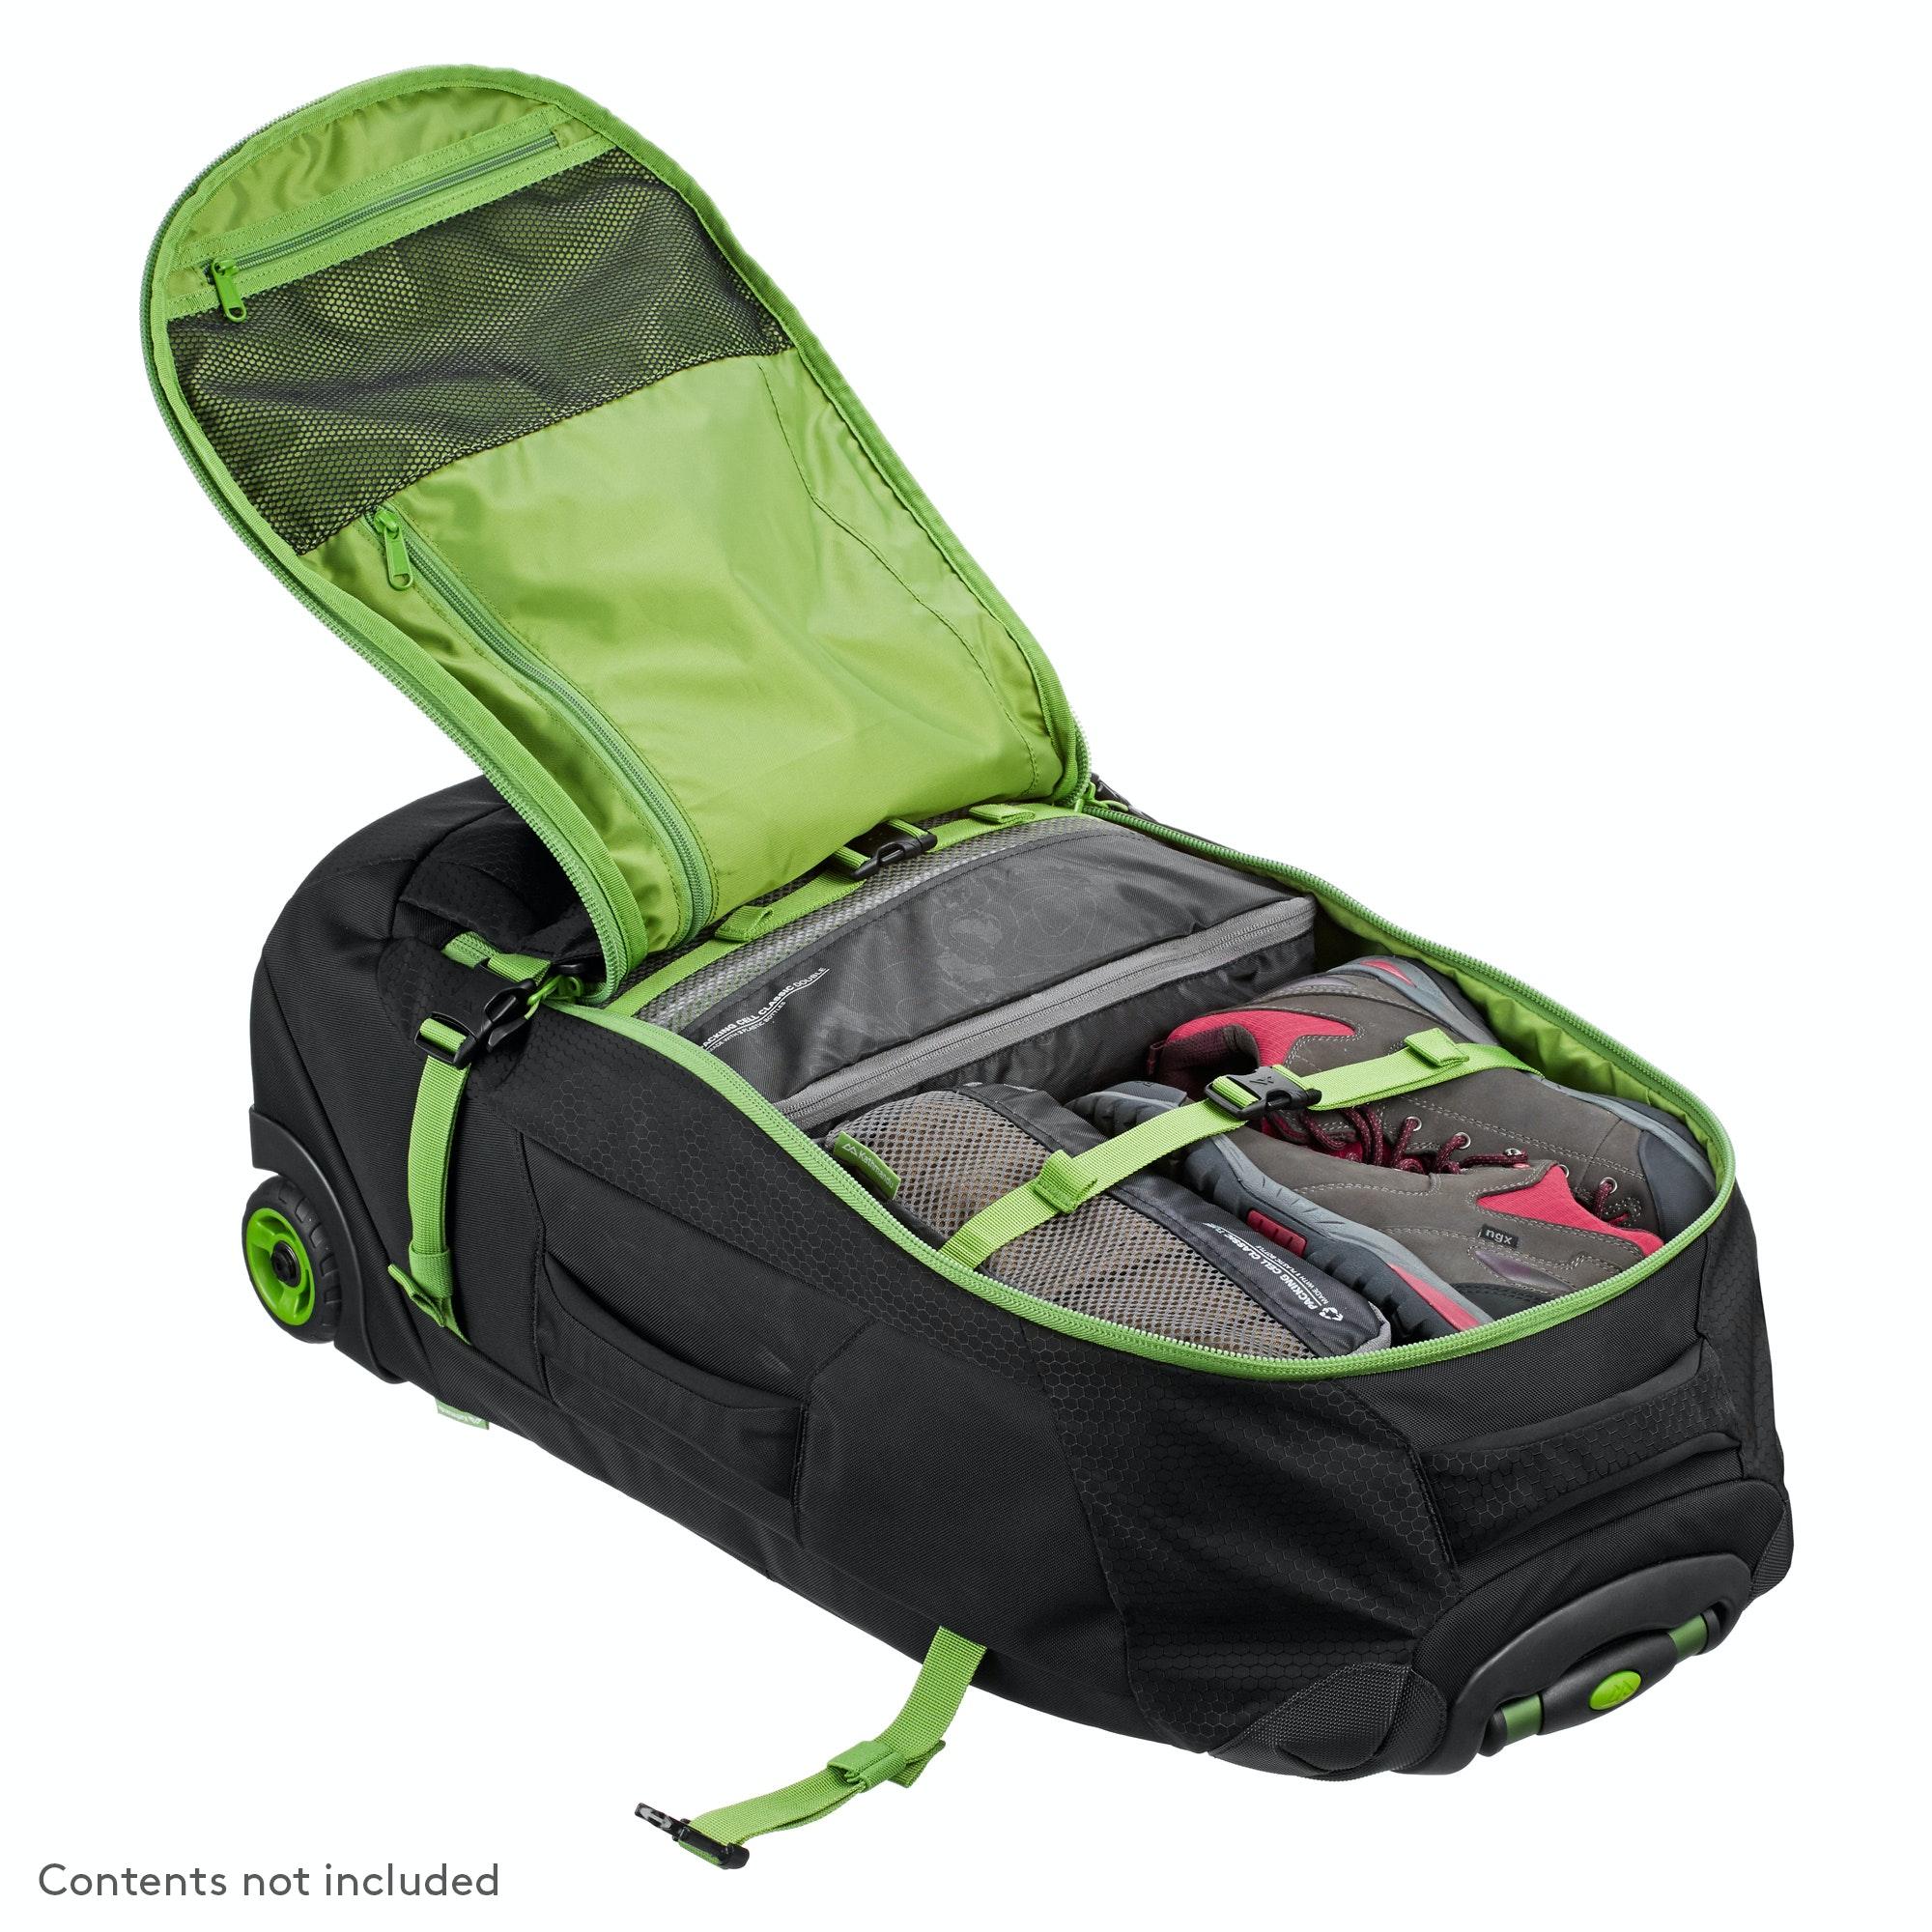 d5a7b1c0a Kathmandu Hybrid 50L Backpack Harness Wheeled Travel Luggage Trolley ...